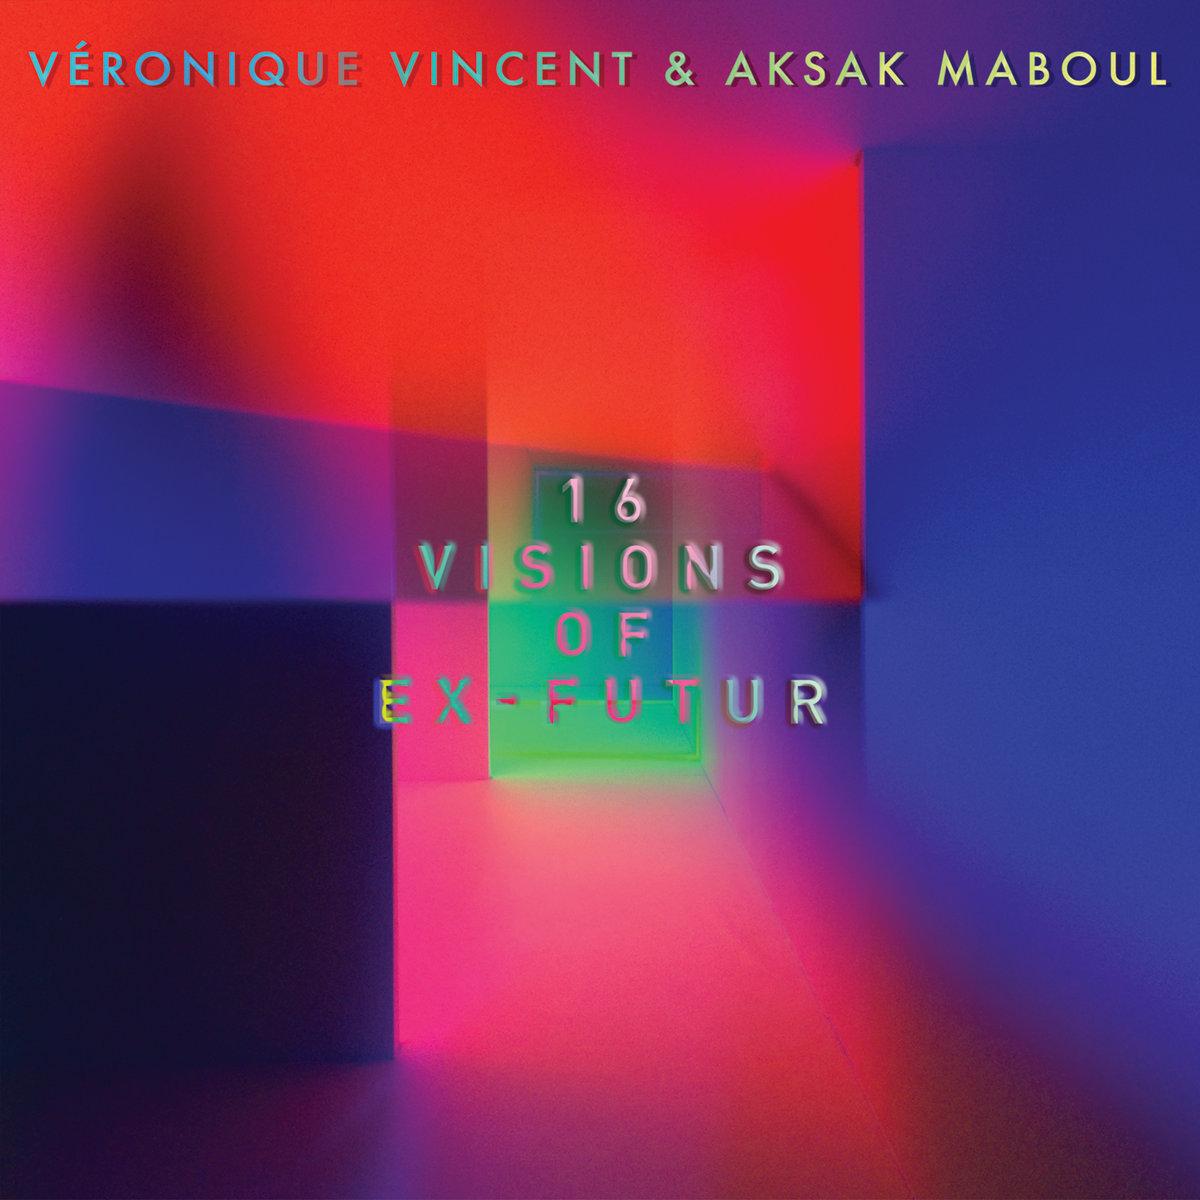 16 visions of ex futur aksak maboul